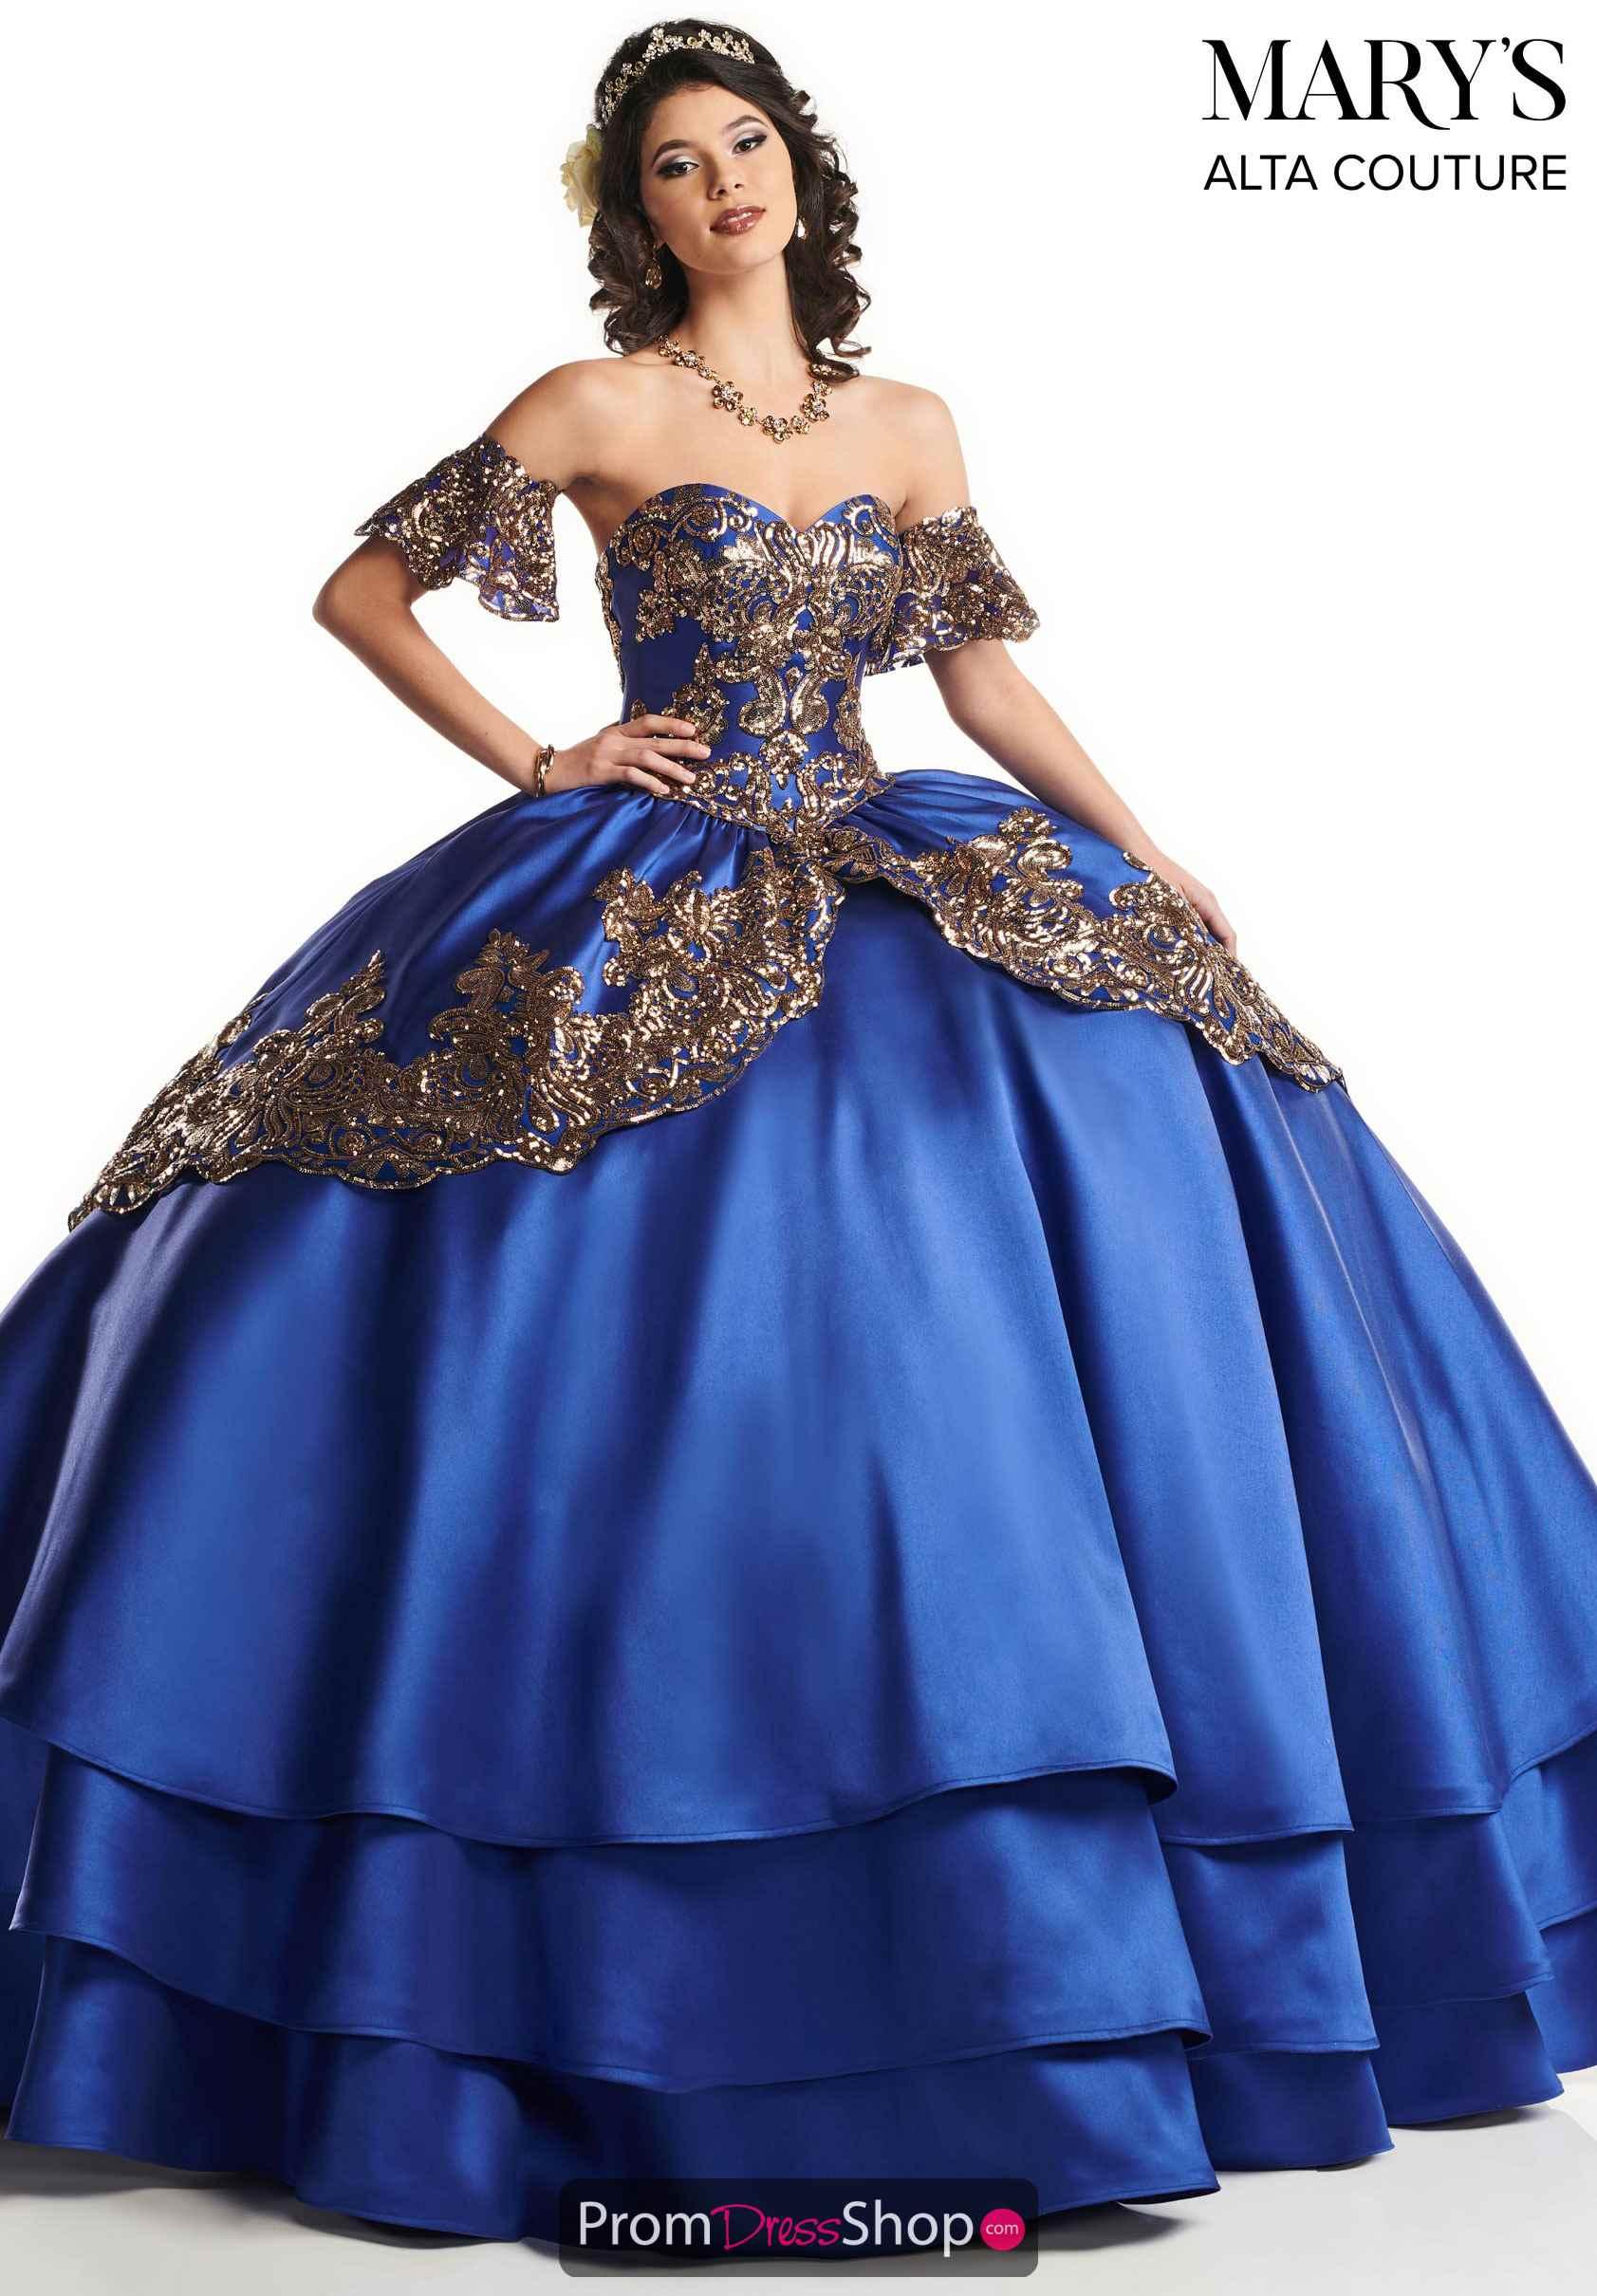 Mary S Dress Mq3030 Promdressshop Com Quince Dresses Quincenera Dresses Pretty Quinceanera Dresses [ 2420 x 1683 Pixel ]